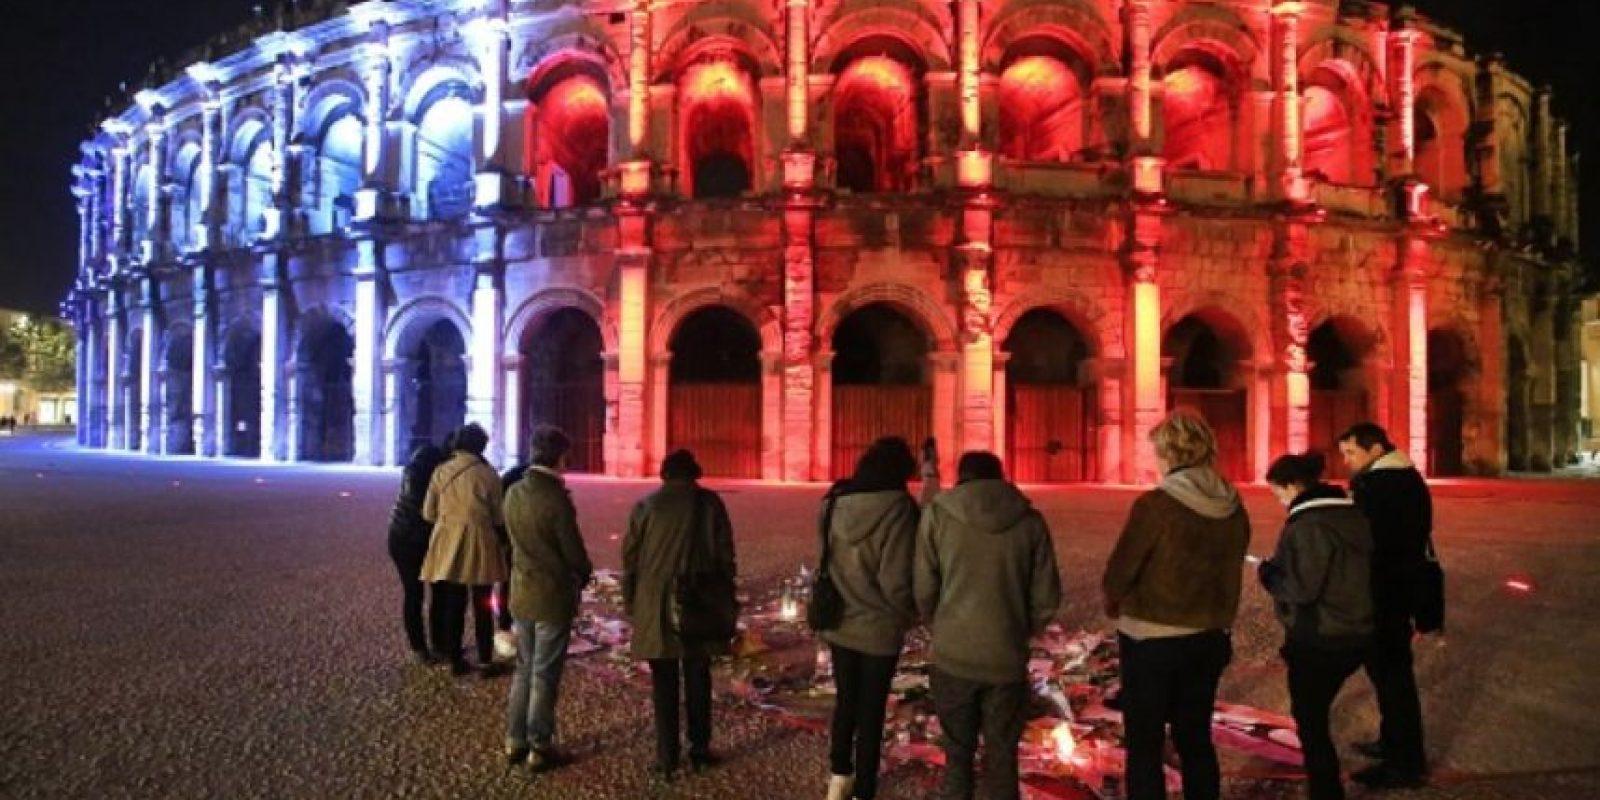 El Coliseo de Roma encendió las luces de la bandera de Francia. Foto:Getty Images